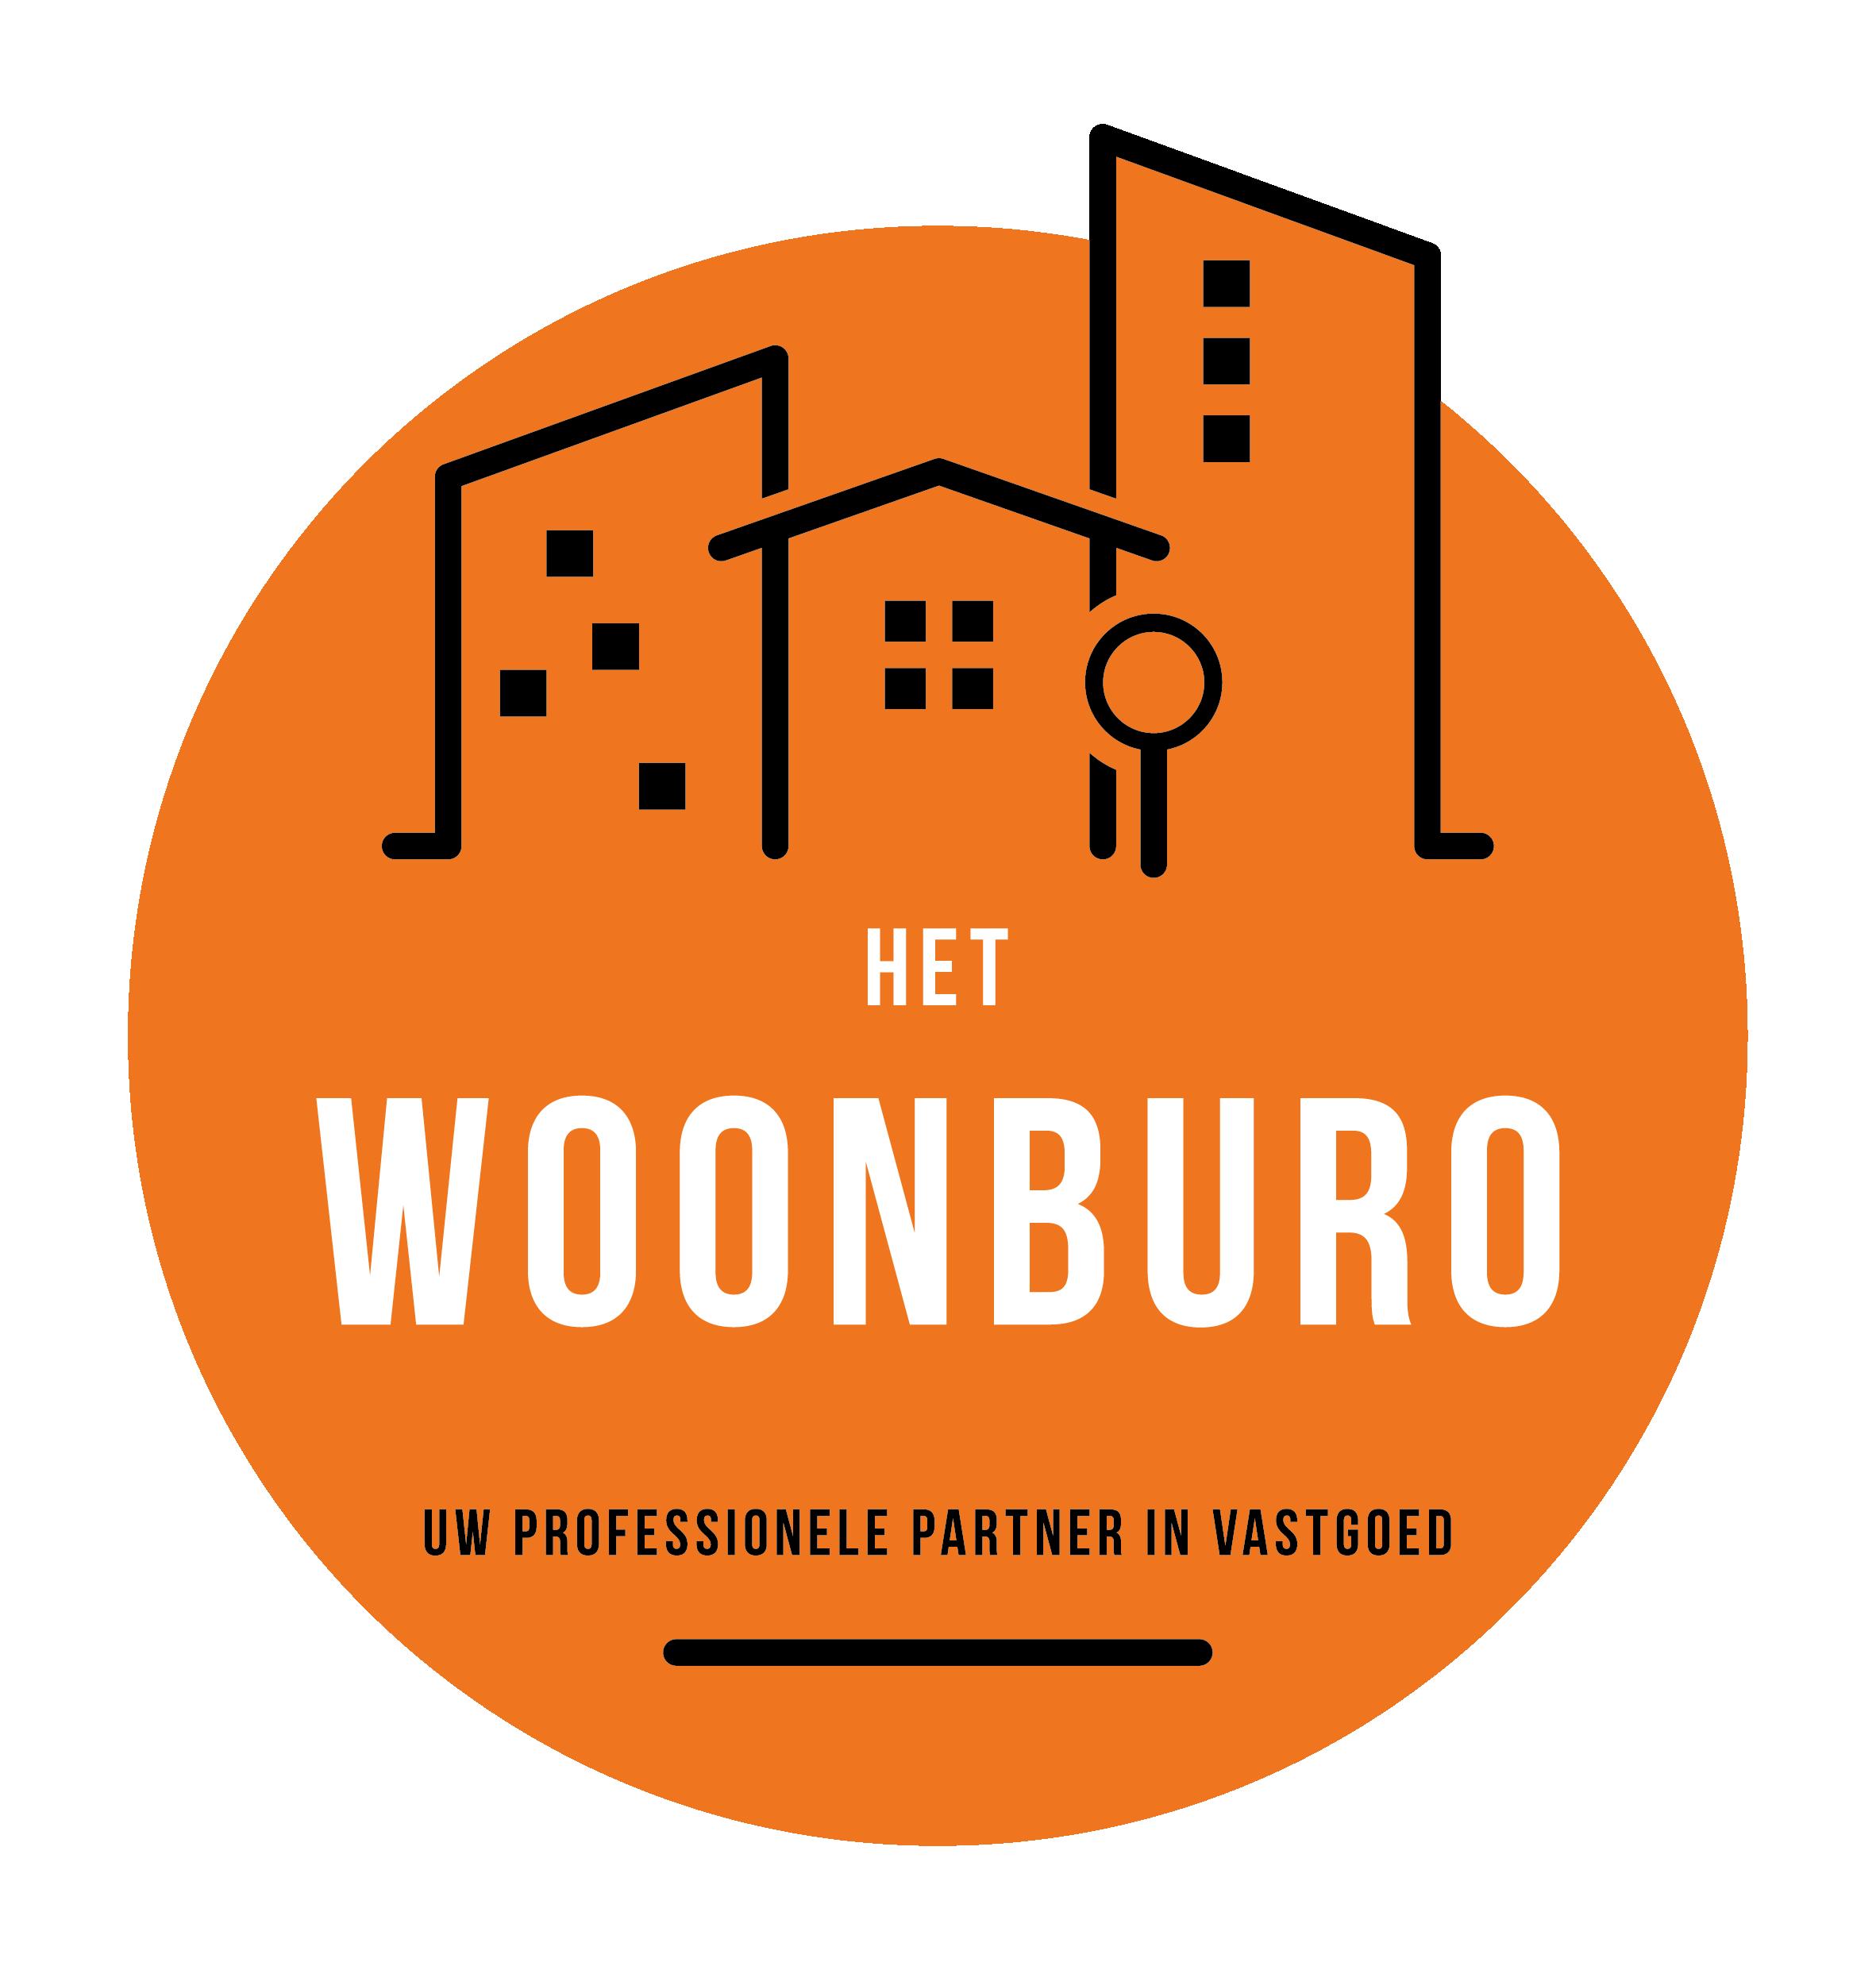 Woonburo